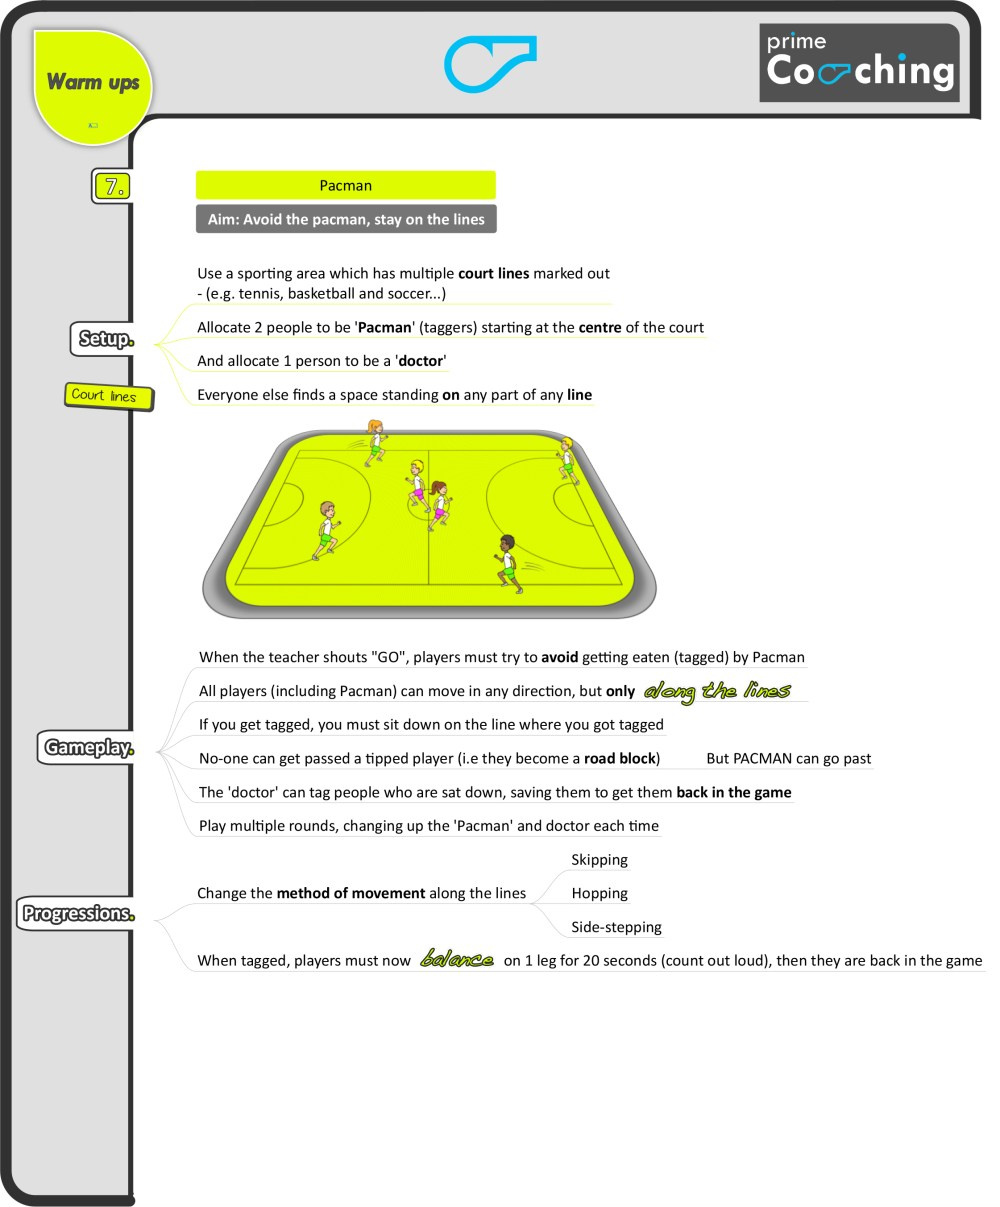 medium resolution of 8 great PE warm-up games – Prime Coaching Sport